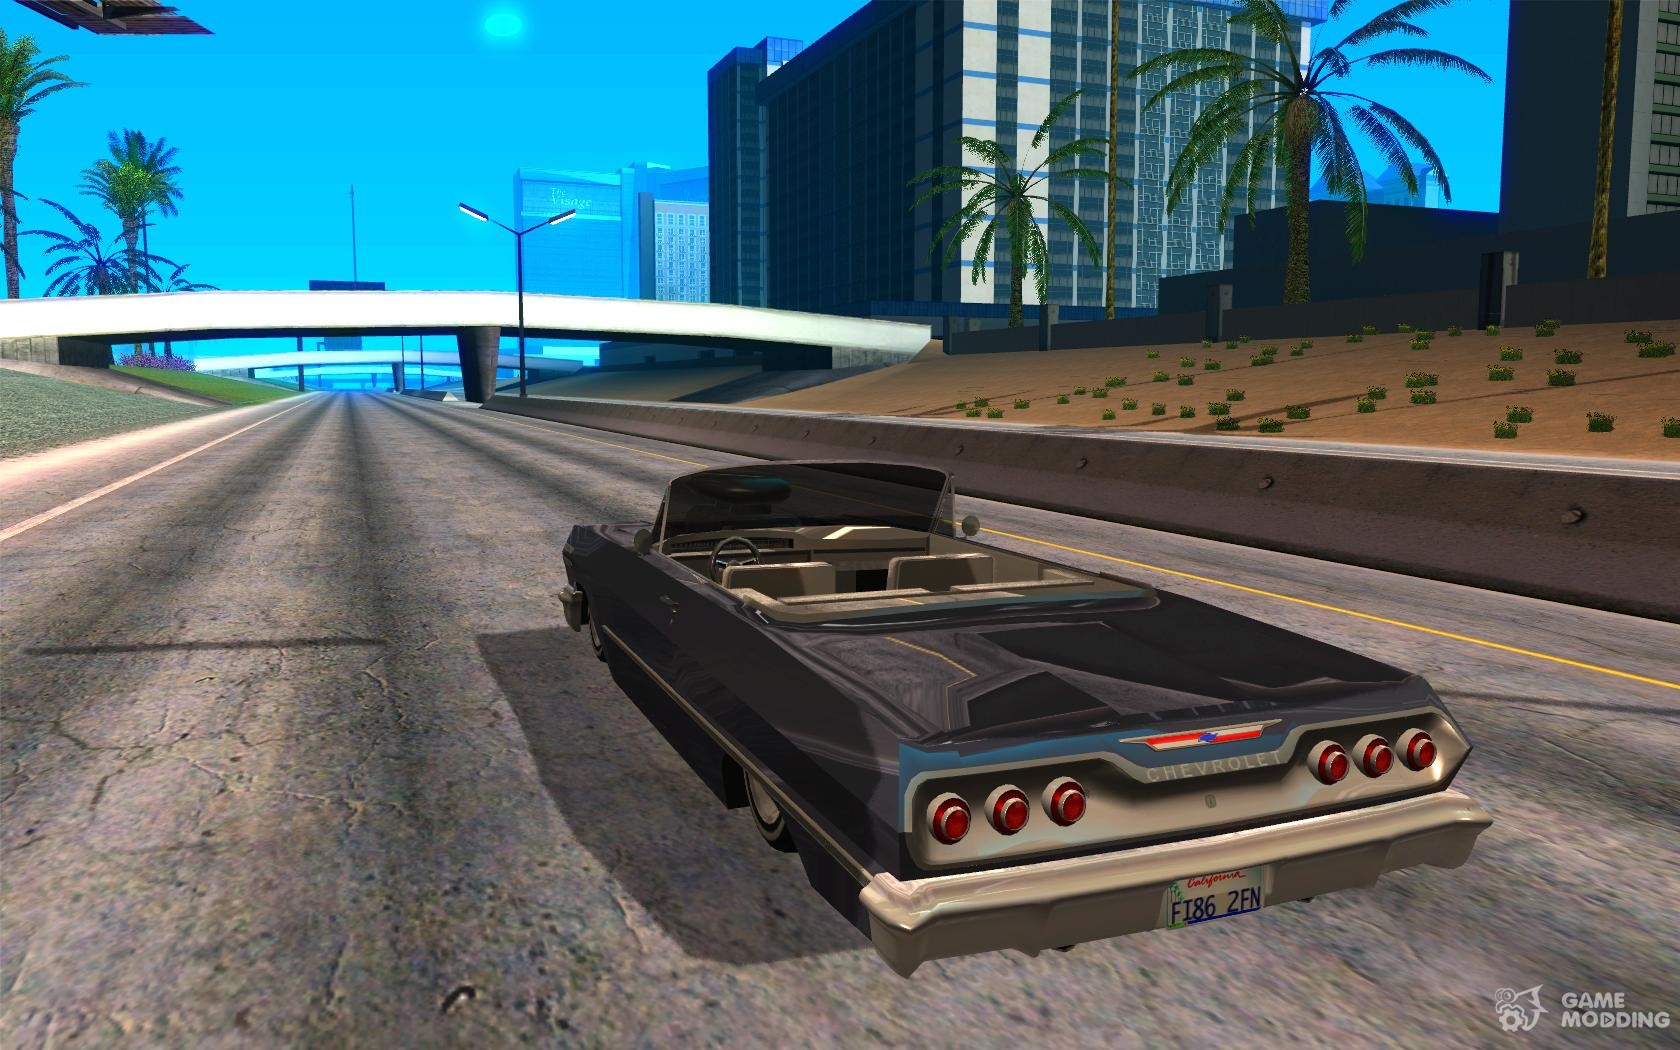 Chevrolet impala 4 door hardtop 1963 for gta san andreas - Chevrolet Impala 1963 Lowrider Charged For Gta San Andreas Rear Left View